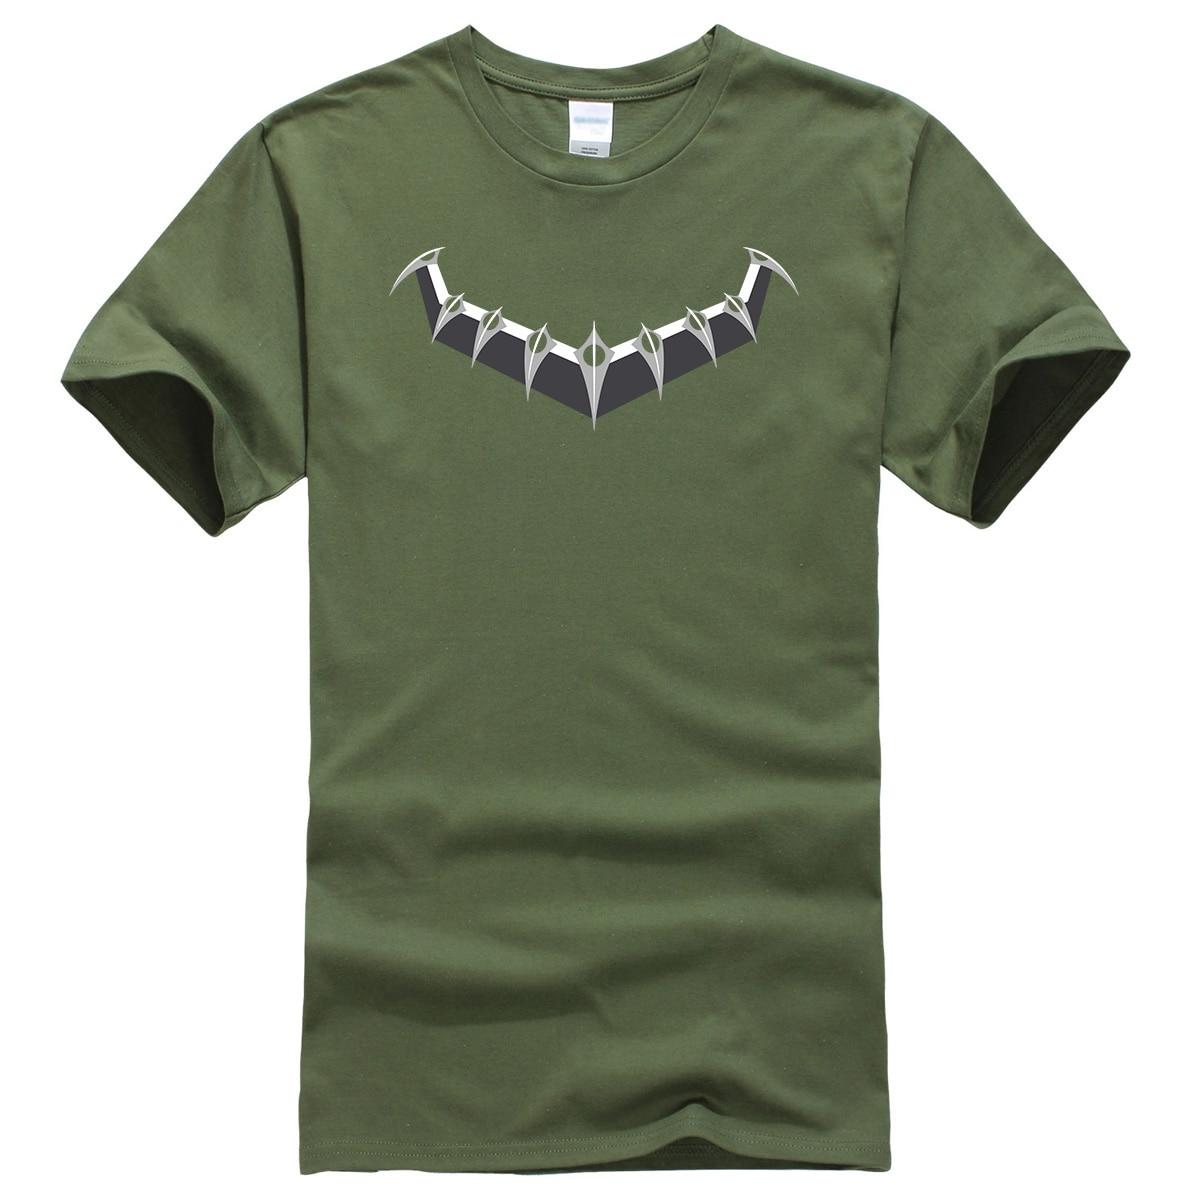 New Fashion 2019 Hot Summer Man's T-shirt Black Panther Top T Shirt Men Superhero Hop Hop Tshirt Streetwear Tops Men's T-shirts